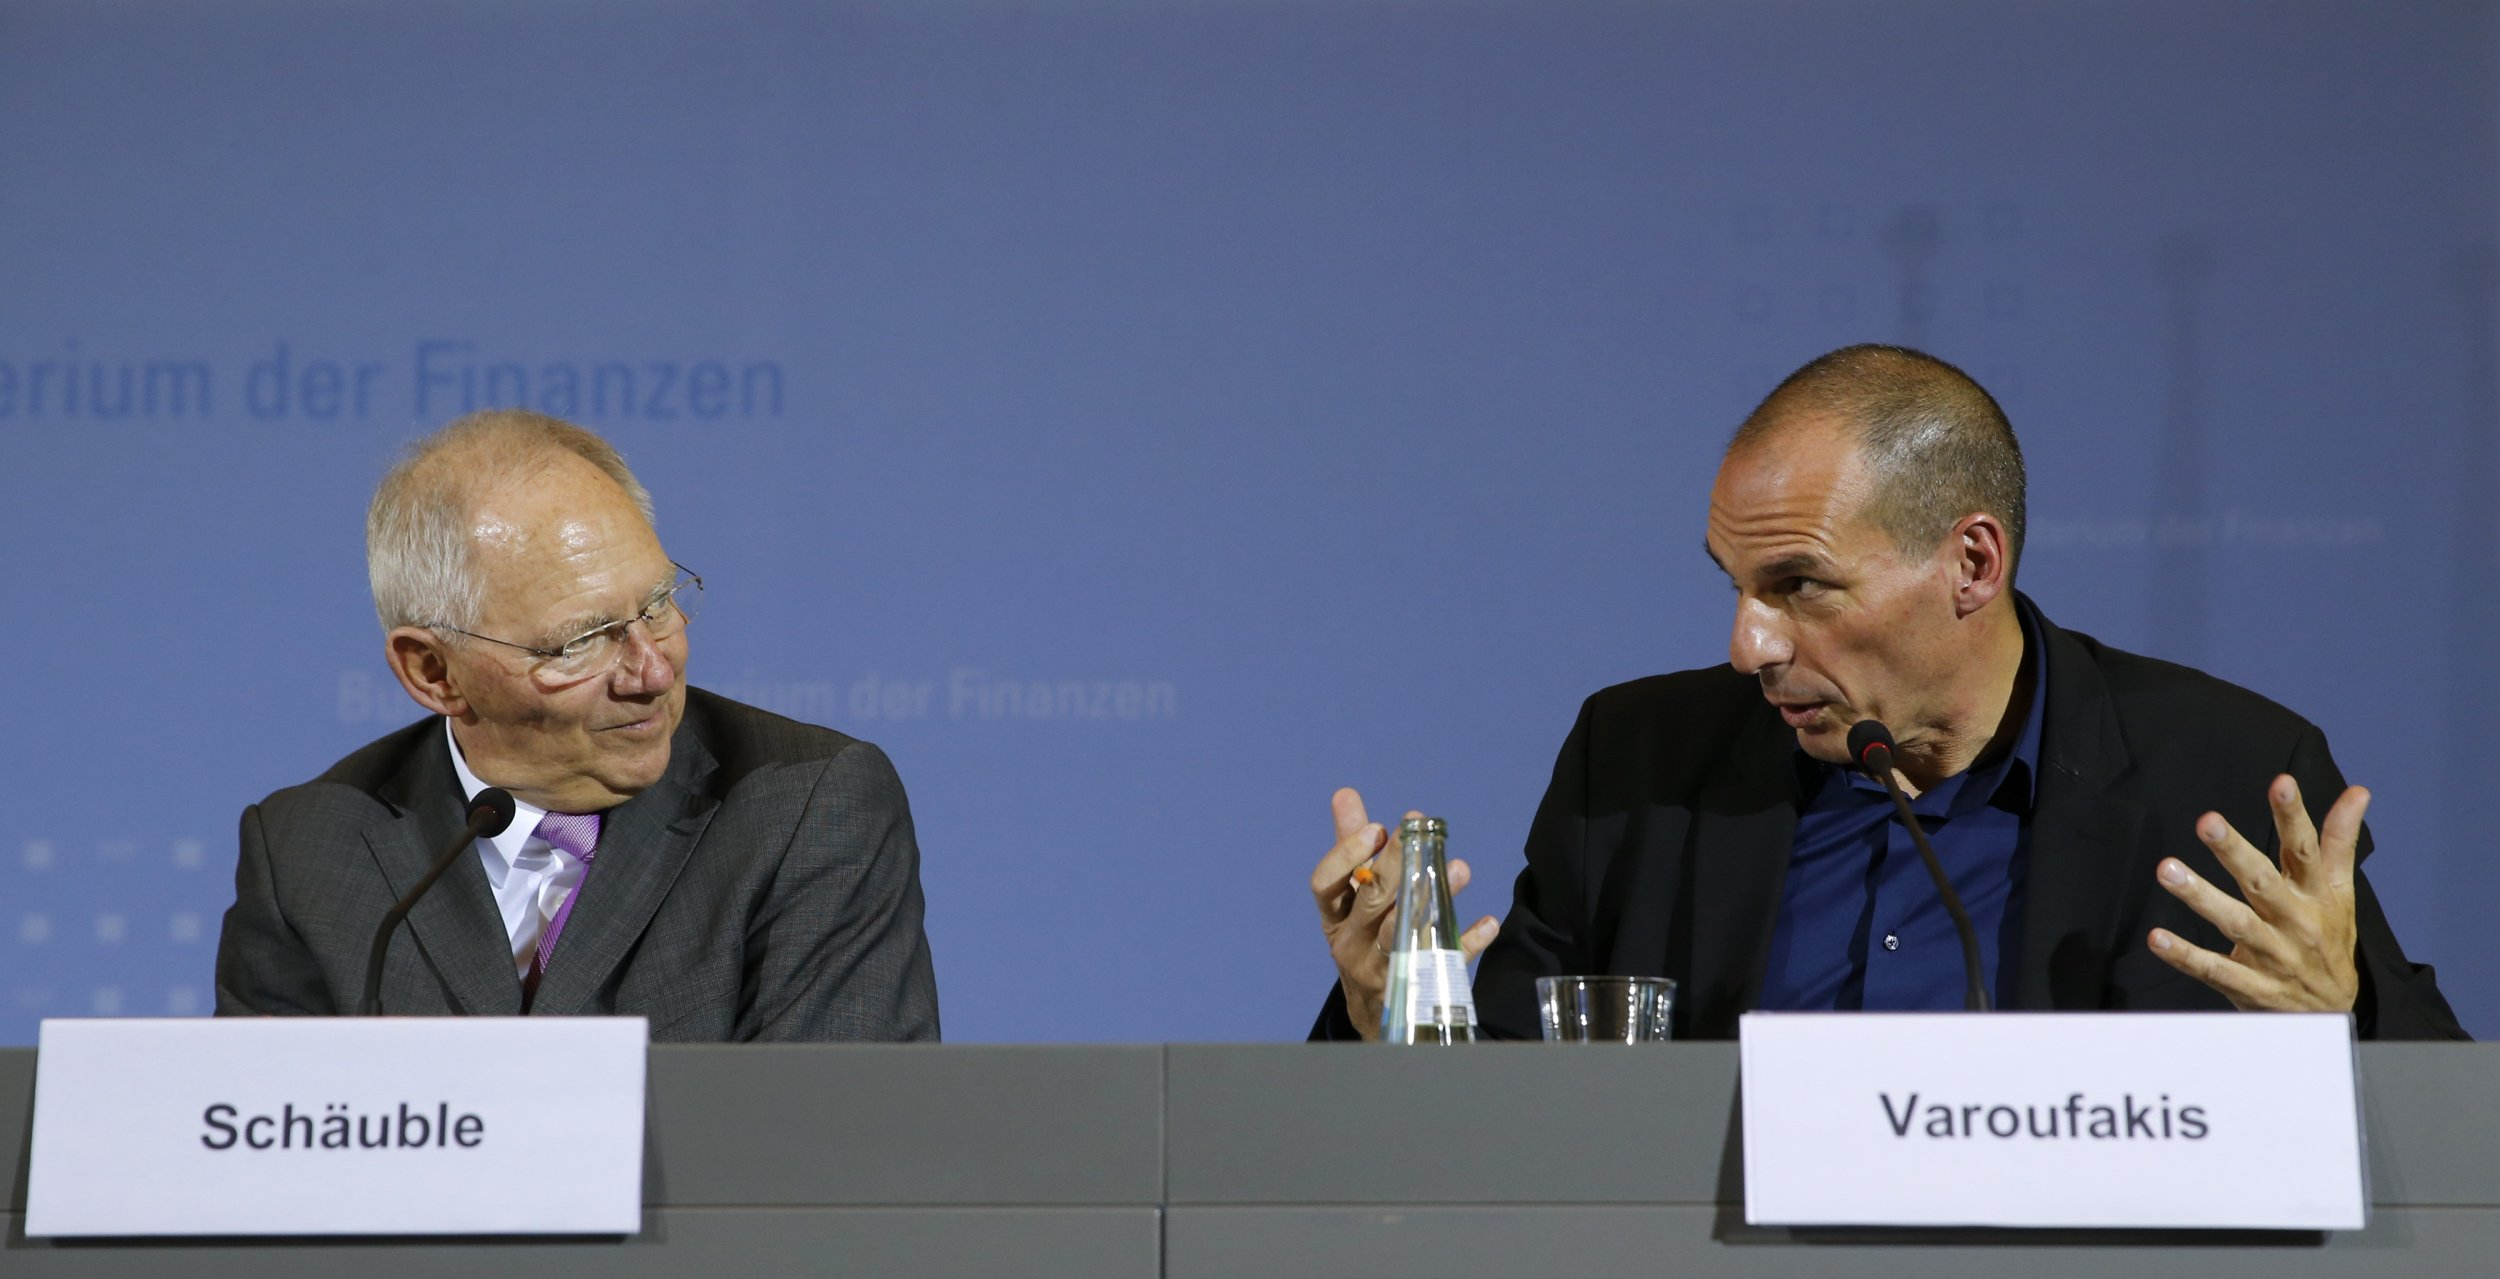 Varoufakis and Schaeuble